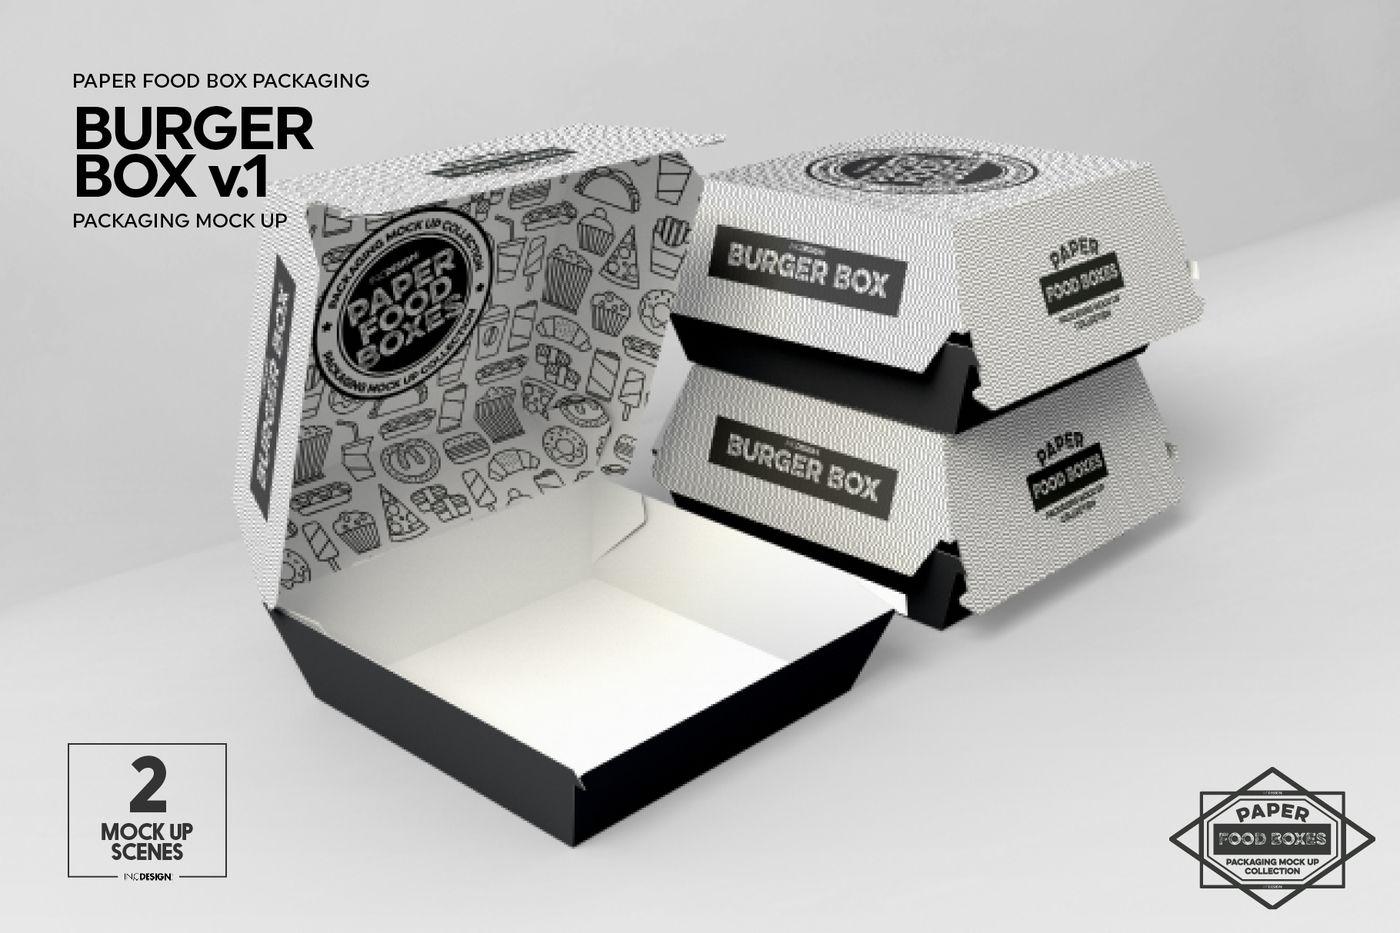 Burger Box V1 Packaging Mockup By Inc Design Studio